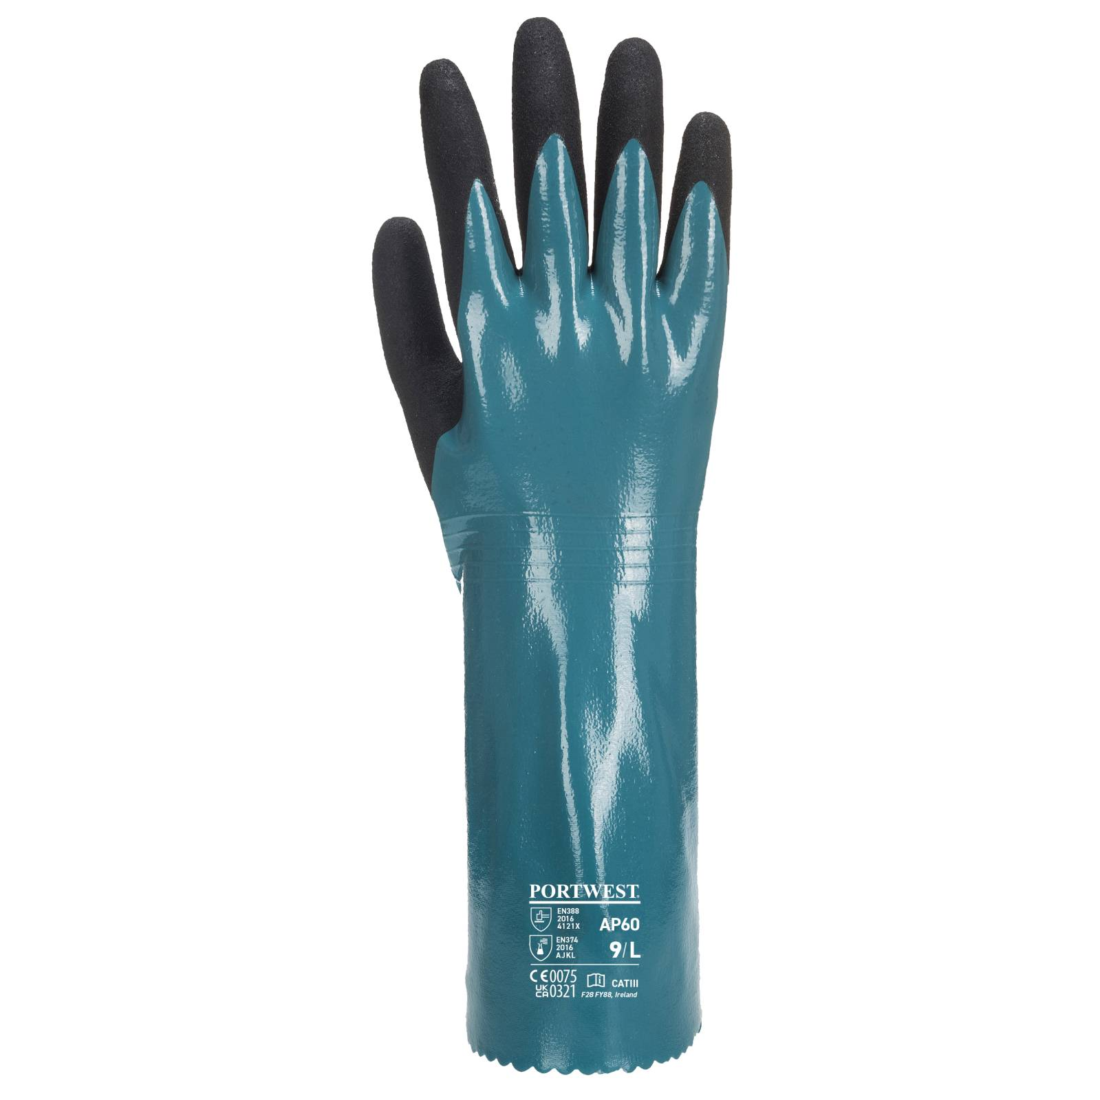 Portwest Handschoenen AP60 blauw-zwart(B8)